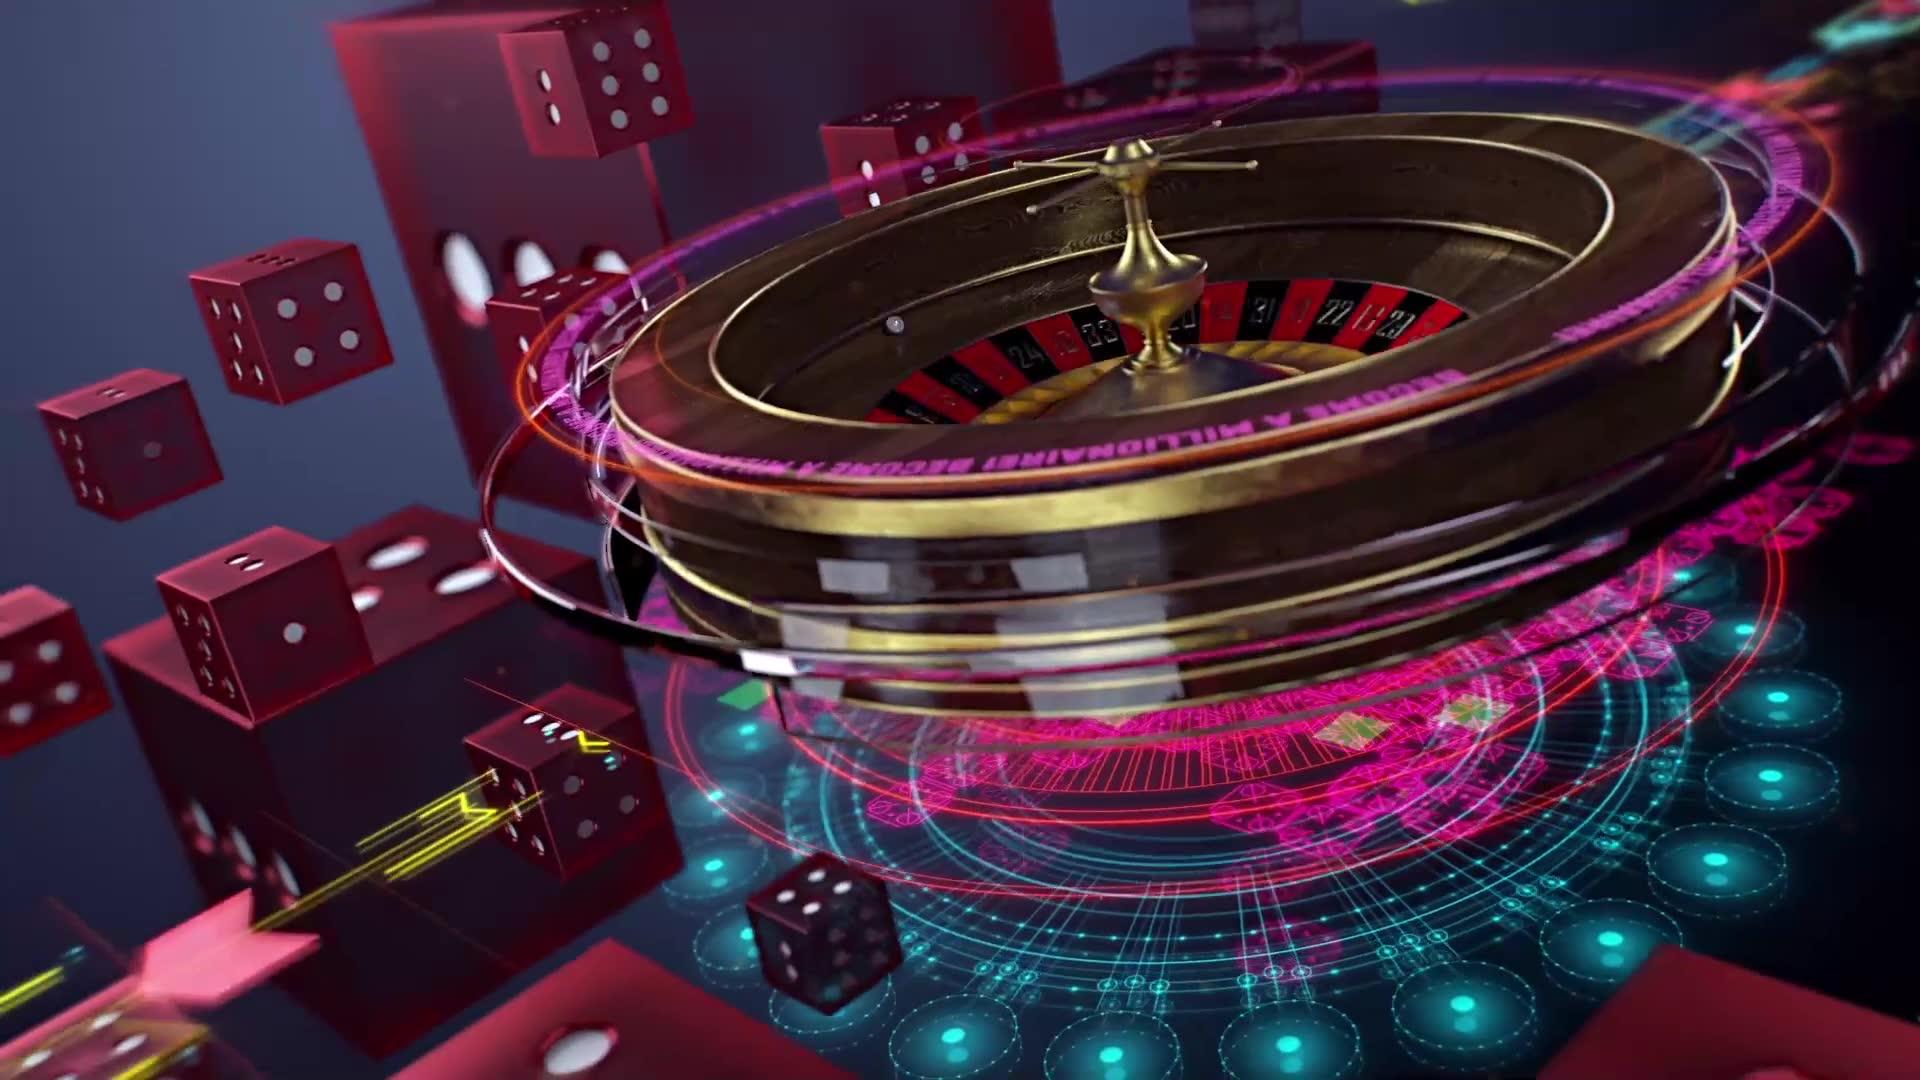 Juicy stakes poker no deposit bonus